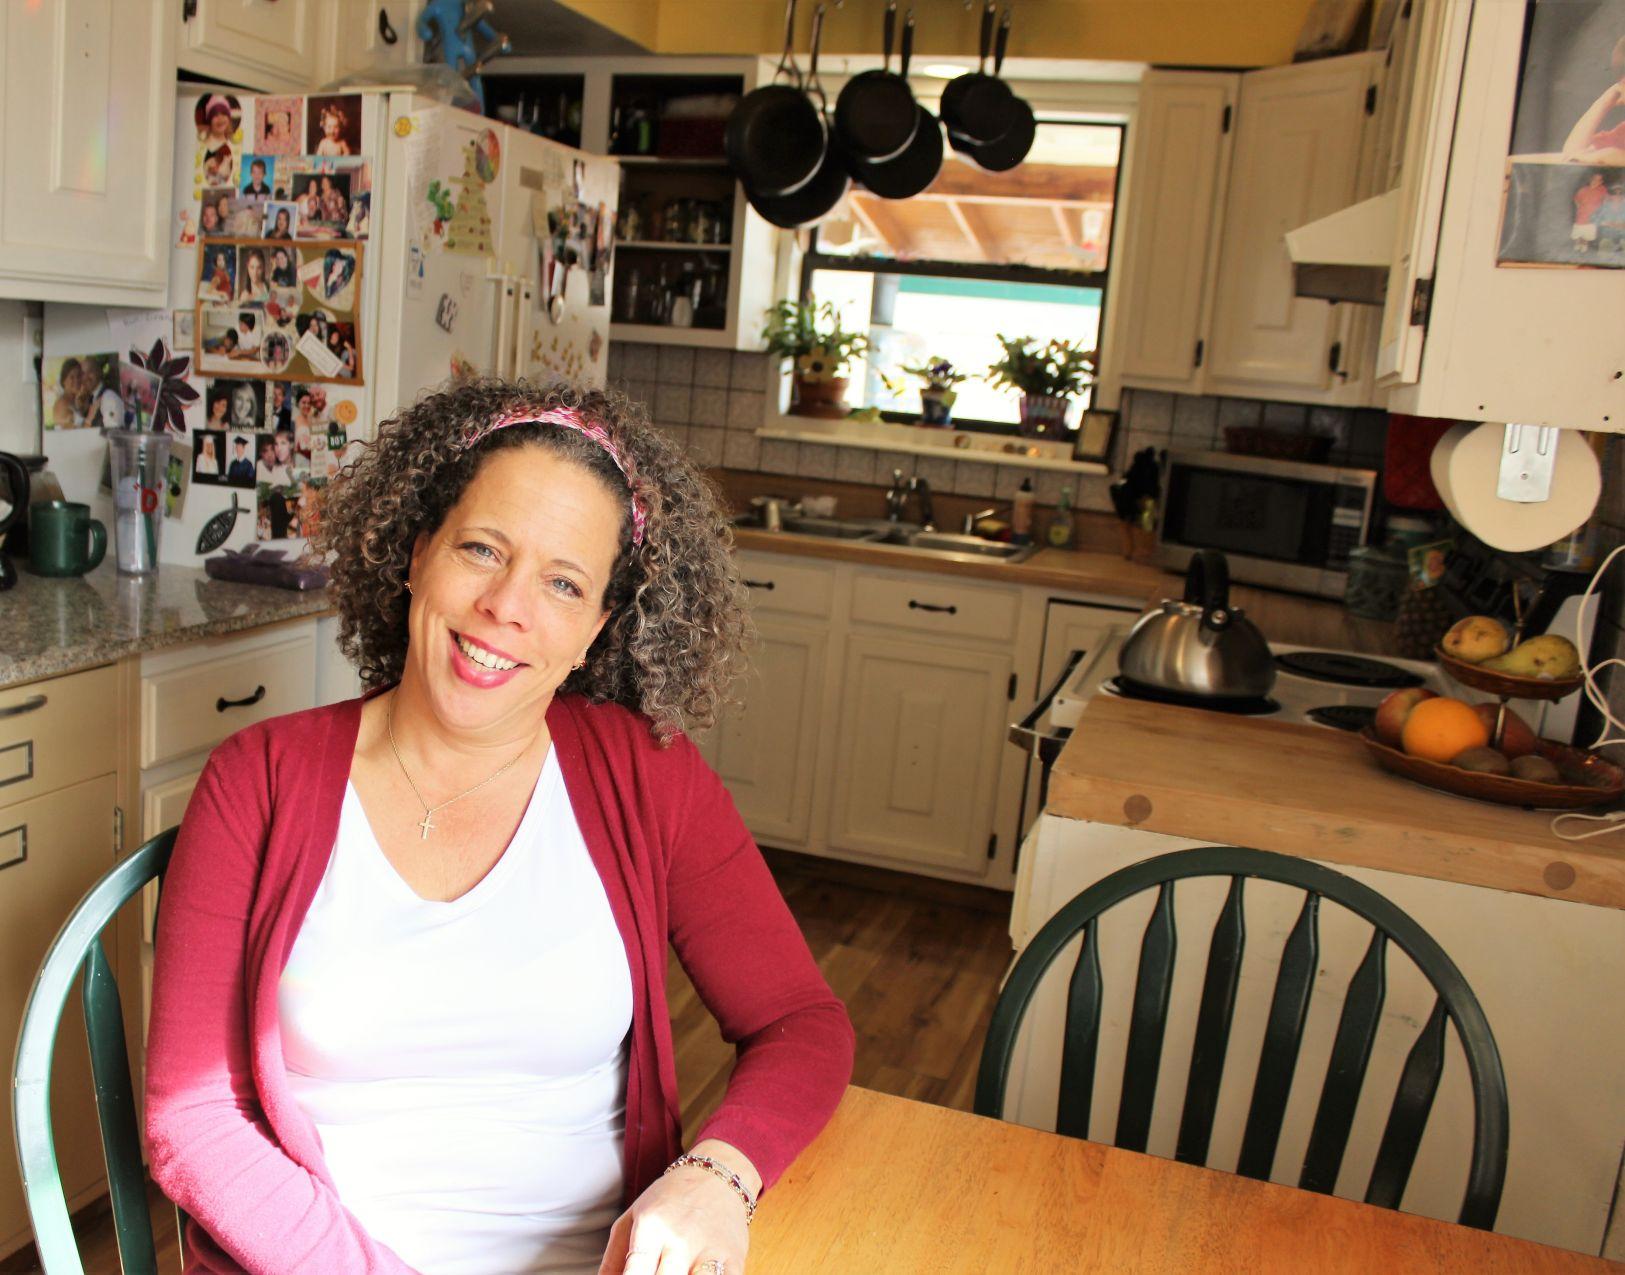 De Anne Dwight sits in the kitchen